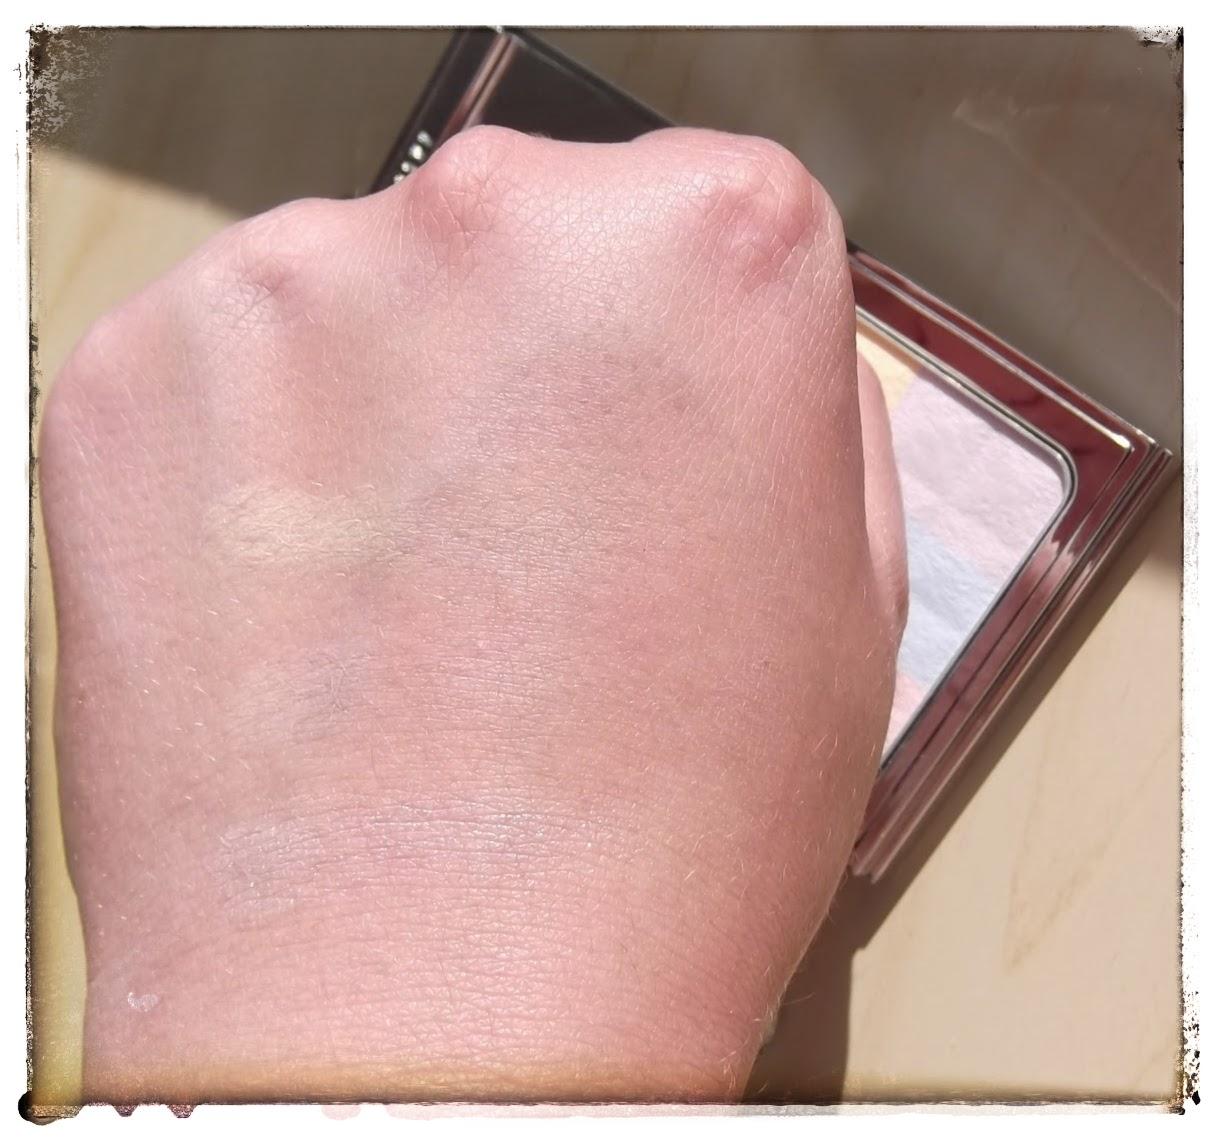 Bobbi brown brightening finishing powder porcelain pearl compact swatch